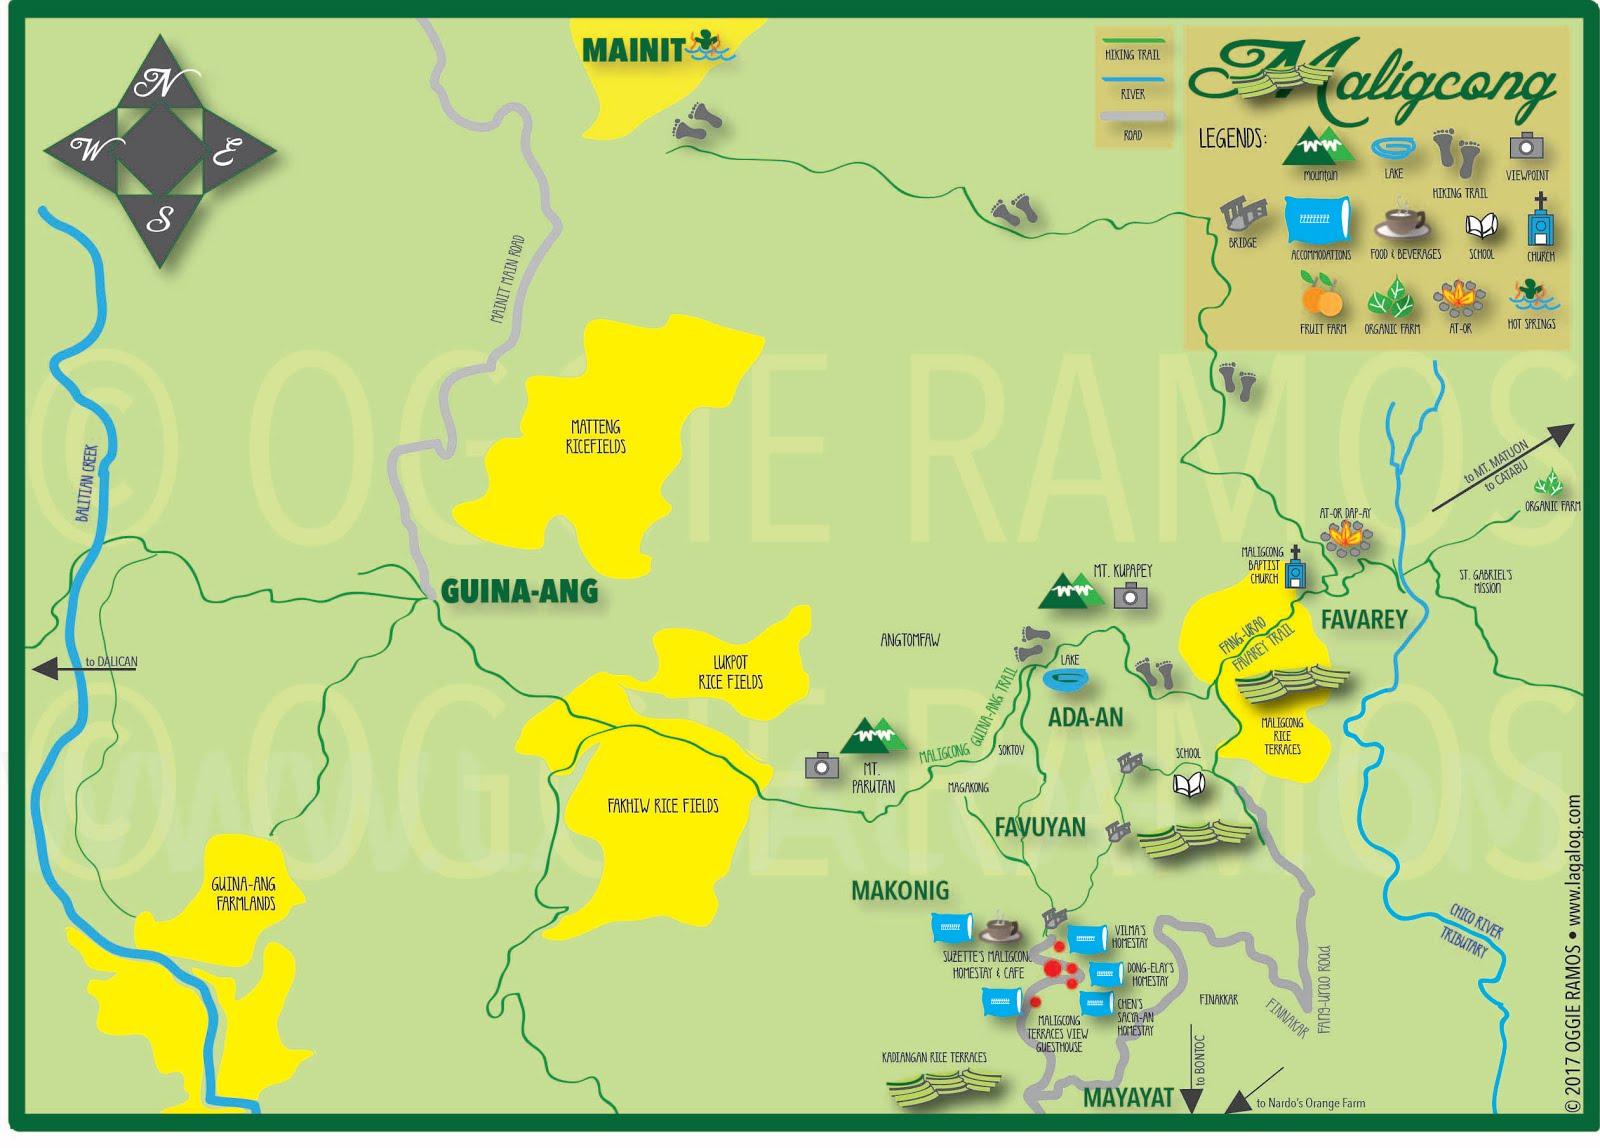 Explore Maligcong